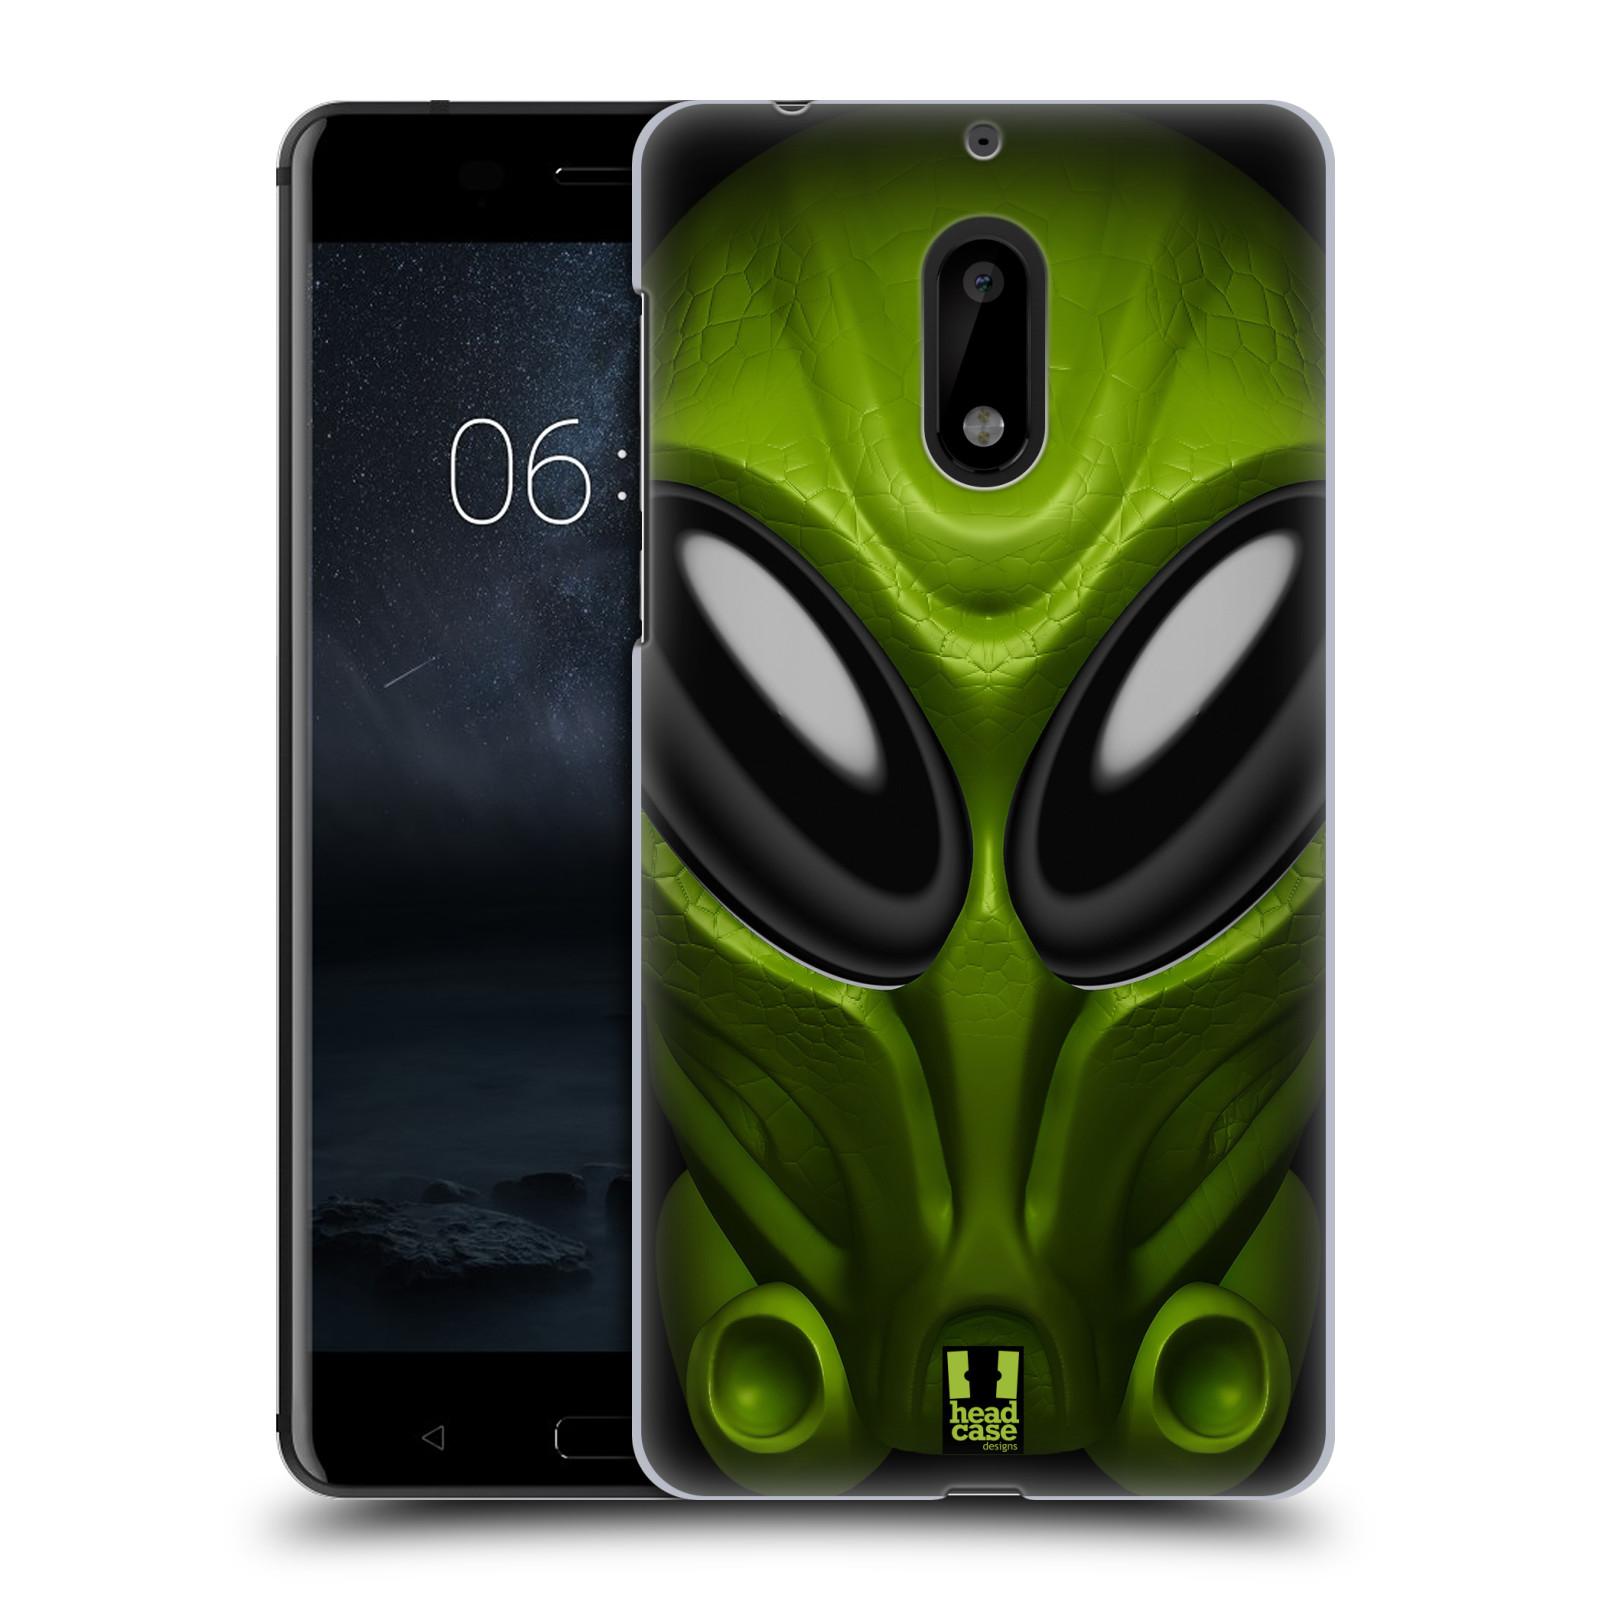 Plastové pouzdro na mobil Nokia 6 - Head Case - Ufoun Mastermind (Plastový kryt či obal na mobilní telefon s motivem Ufouna Masterminda pro Nokia 6 (Dual SIM))